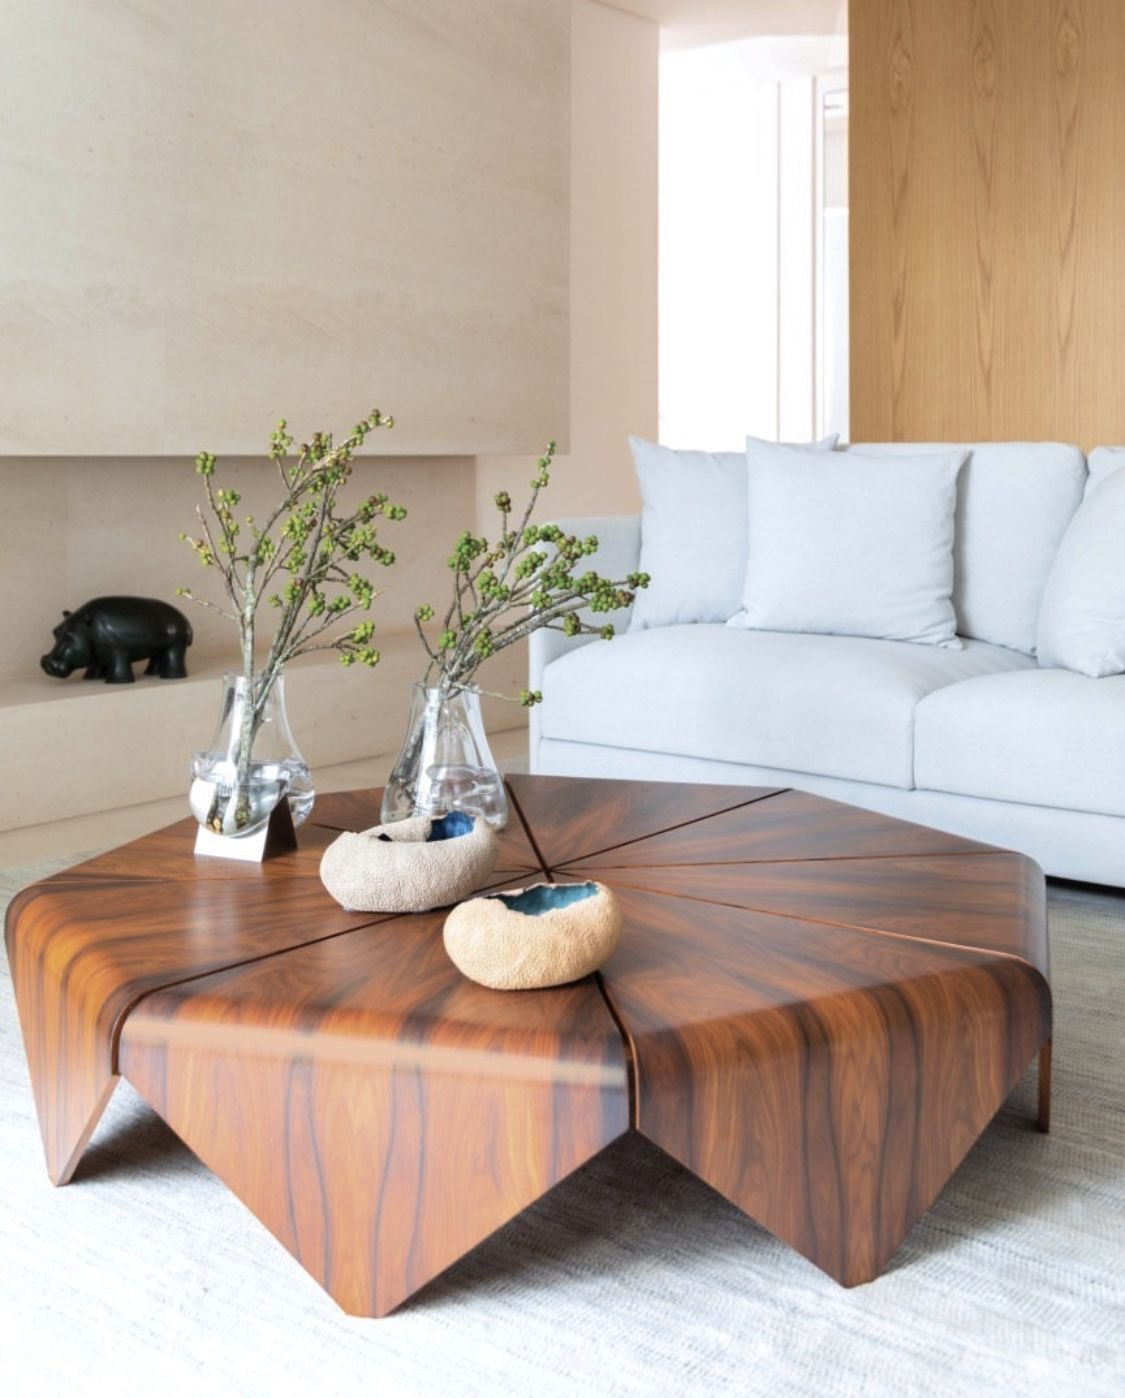 Weekend Furniture India Mahdavi In 2021 Furniture India Side Table Design Table Design [ 1000 x 1000 Pixel ]